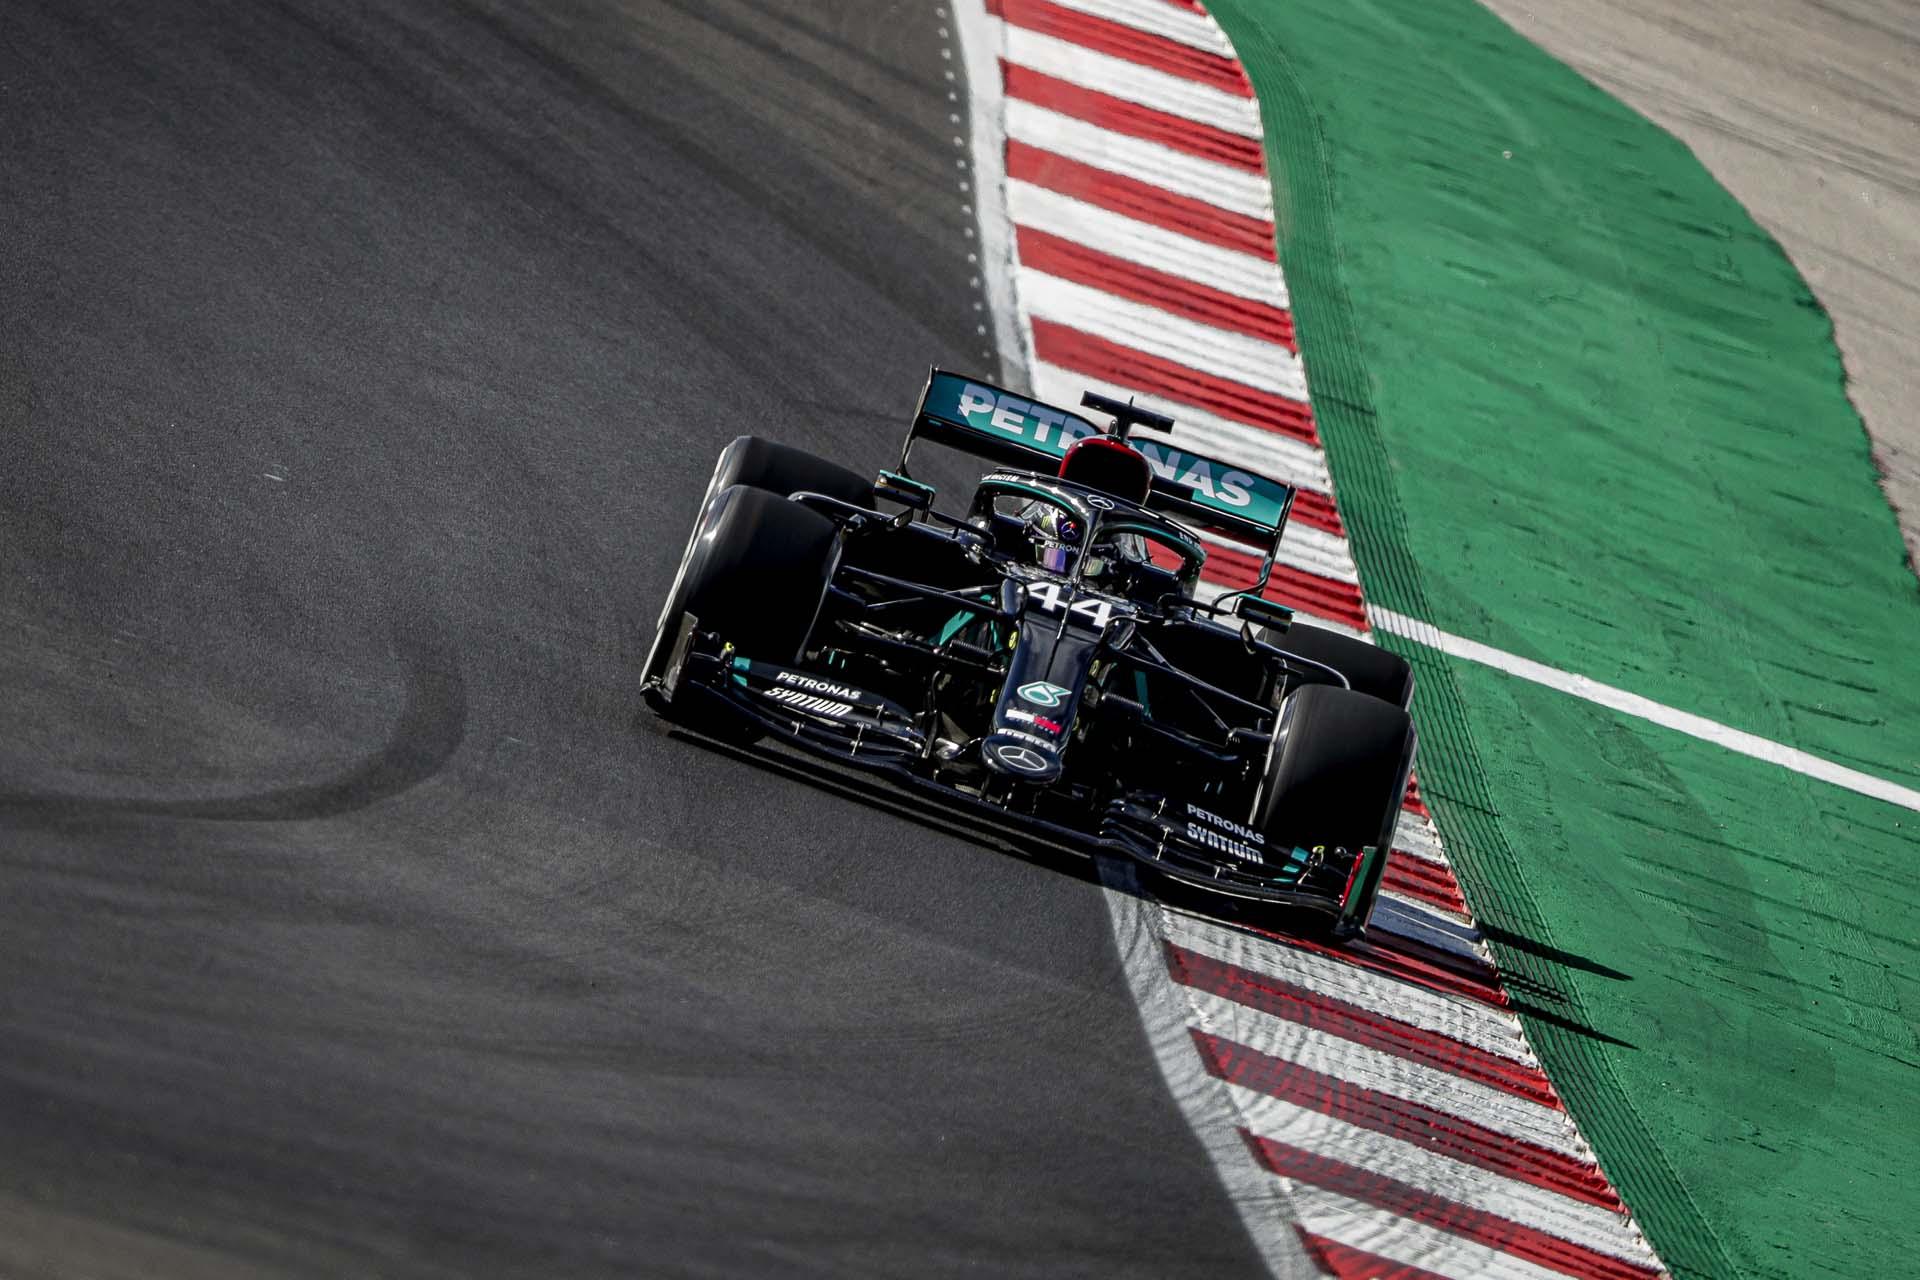 2020 Portuguese Grand Prix, Saturday - Wolfgang Wilhelm